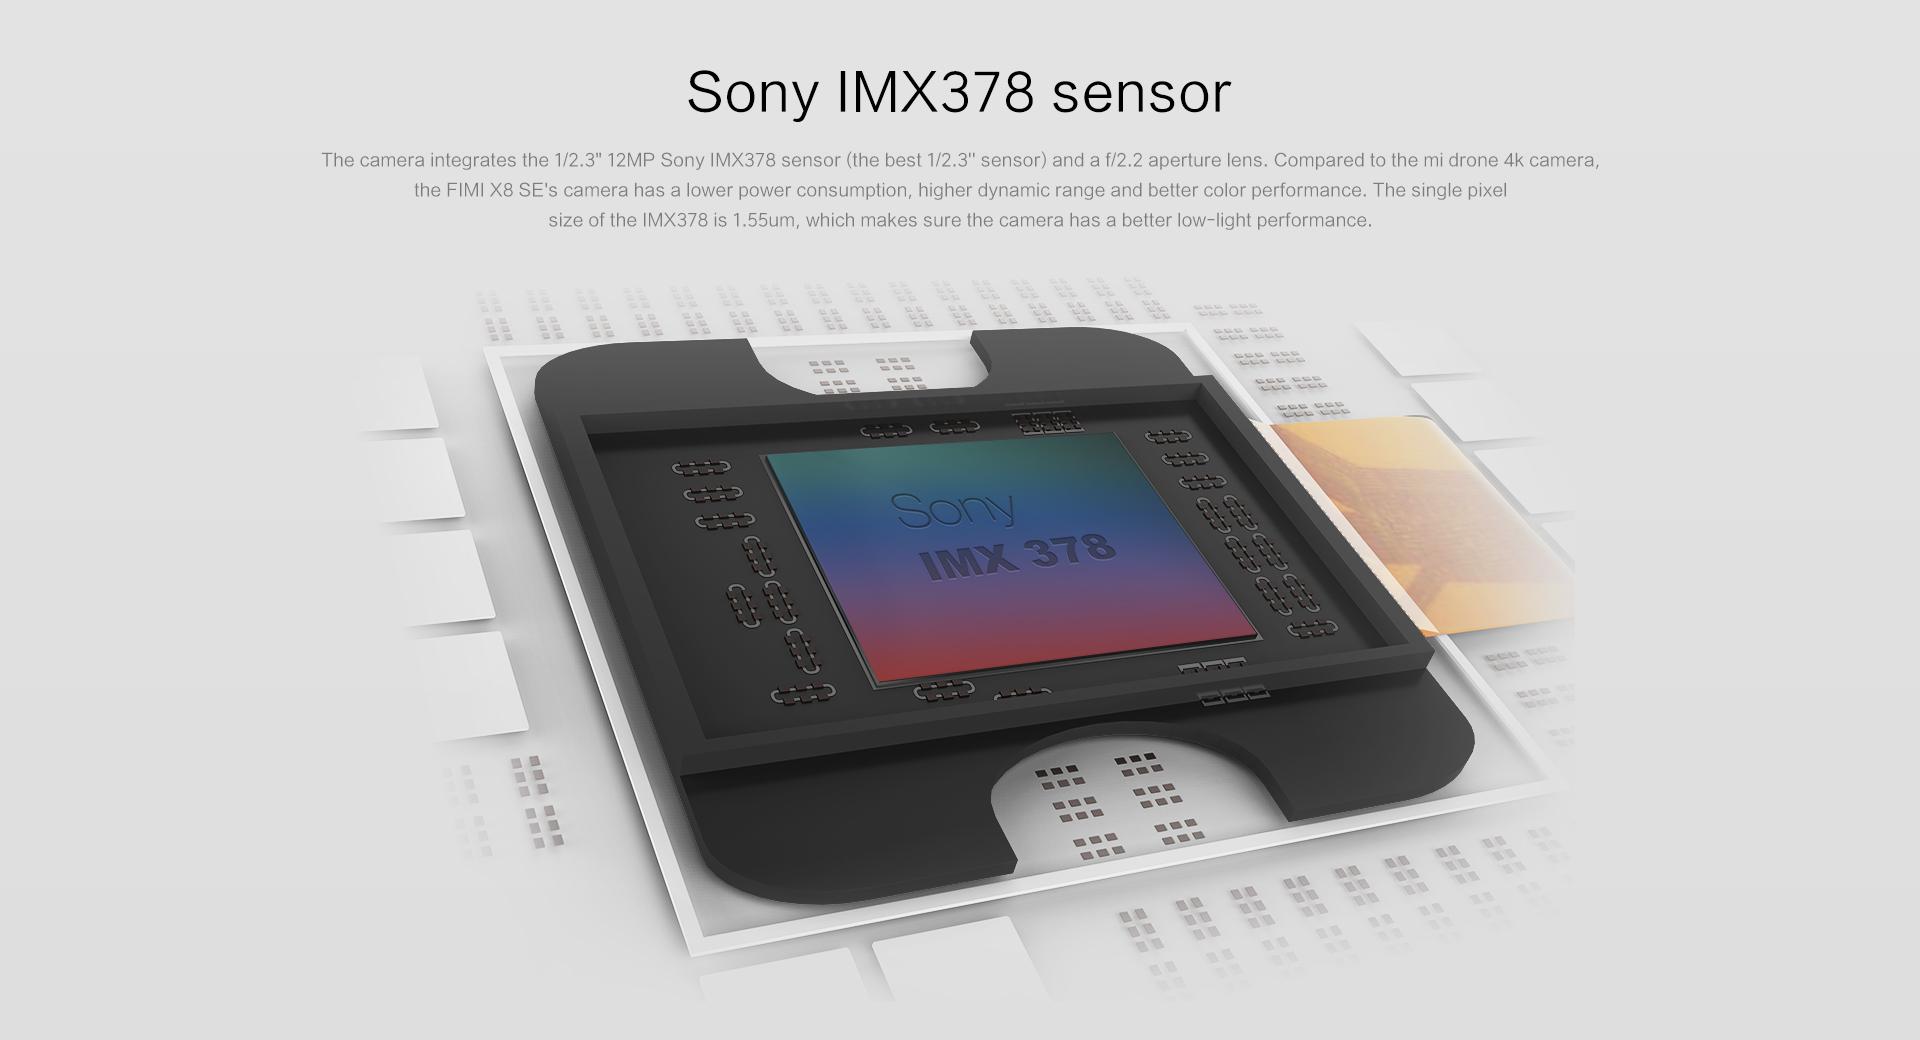 sony camera sensor for xiaomi drone